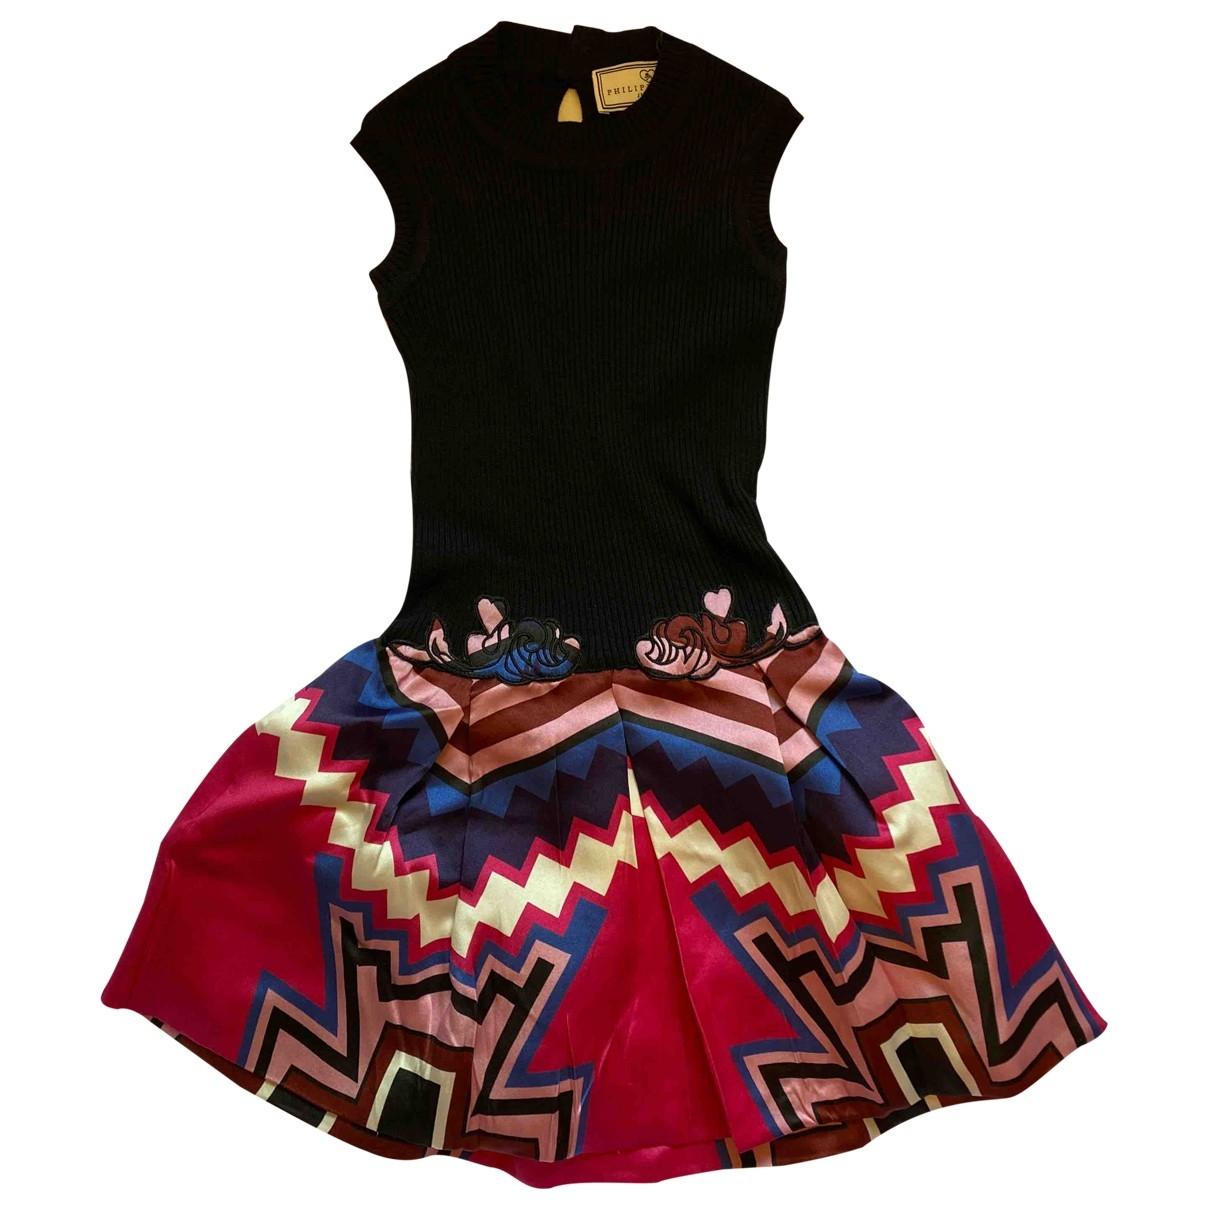 Philipp Plein \N Multicolour Cotton dress for Women 000 0-5